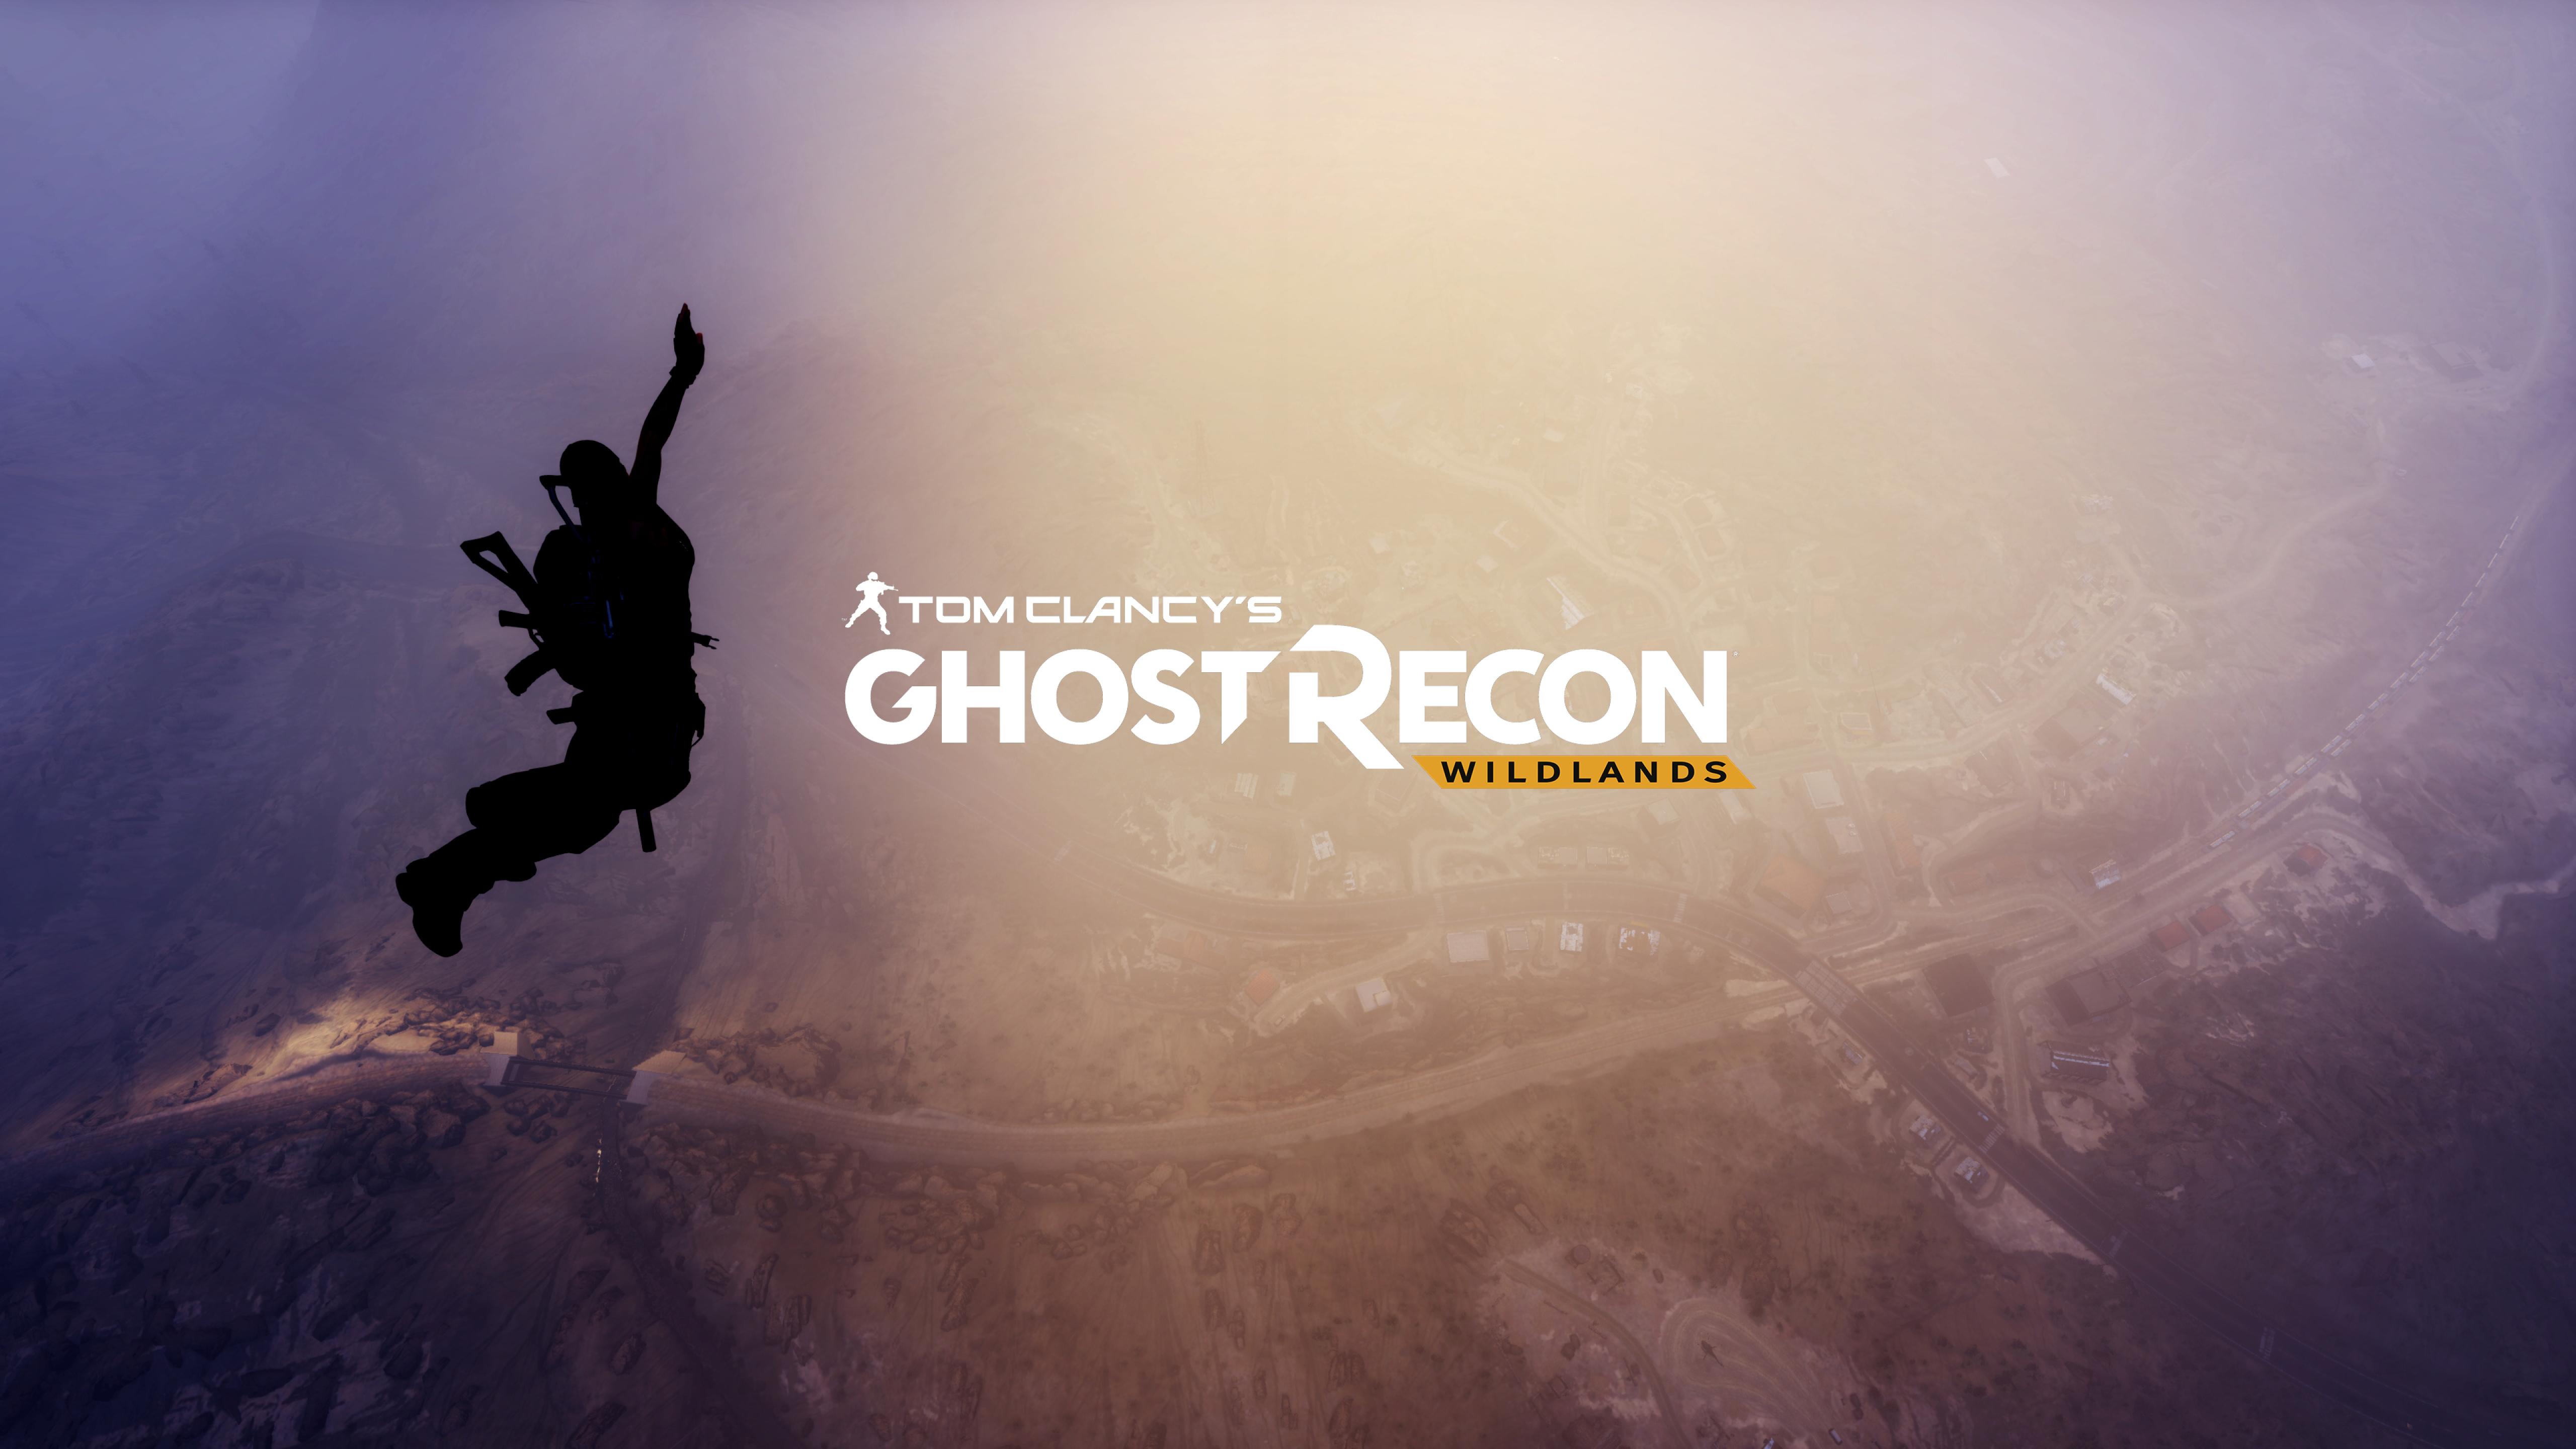 5120x2880 Tom Clancys Ghost Recon Wildlands Logo 5k Wallpaper Hd